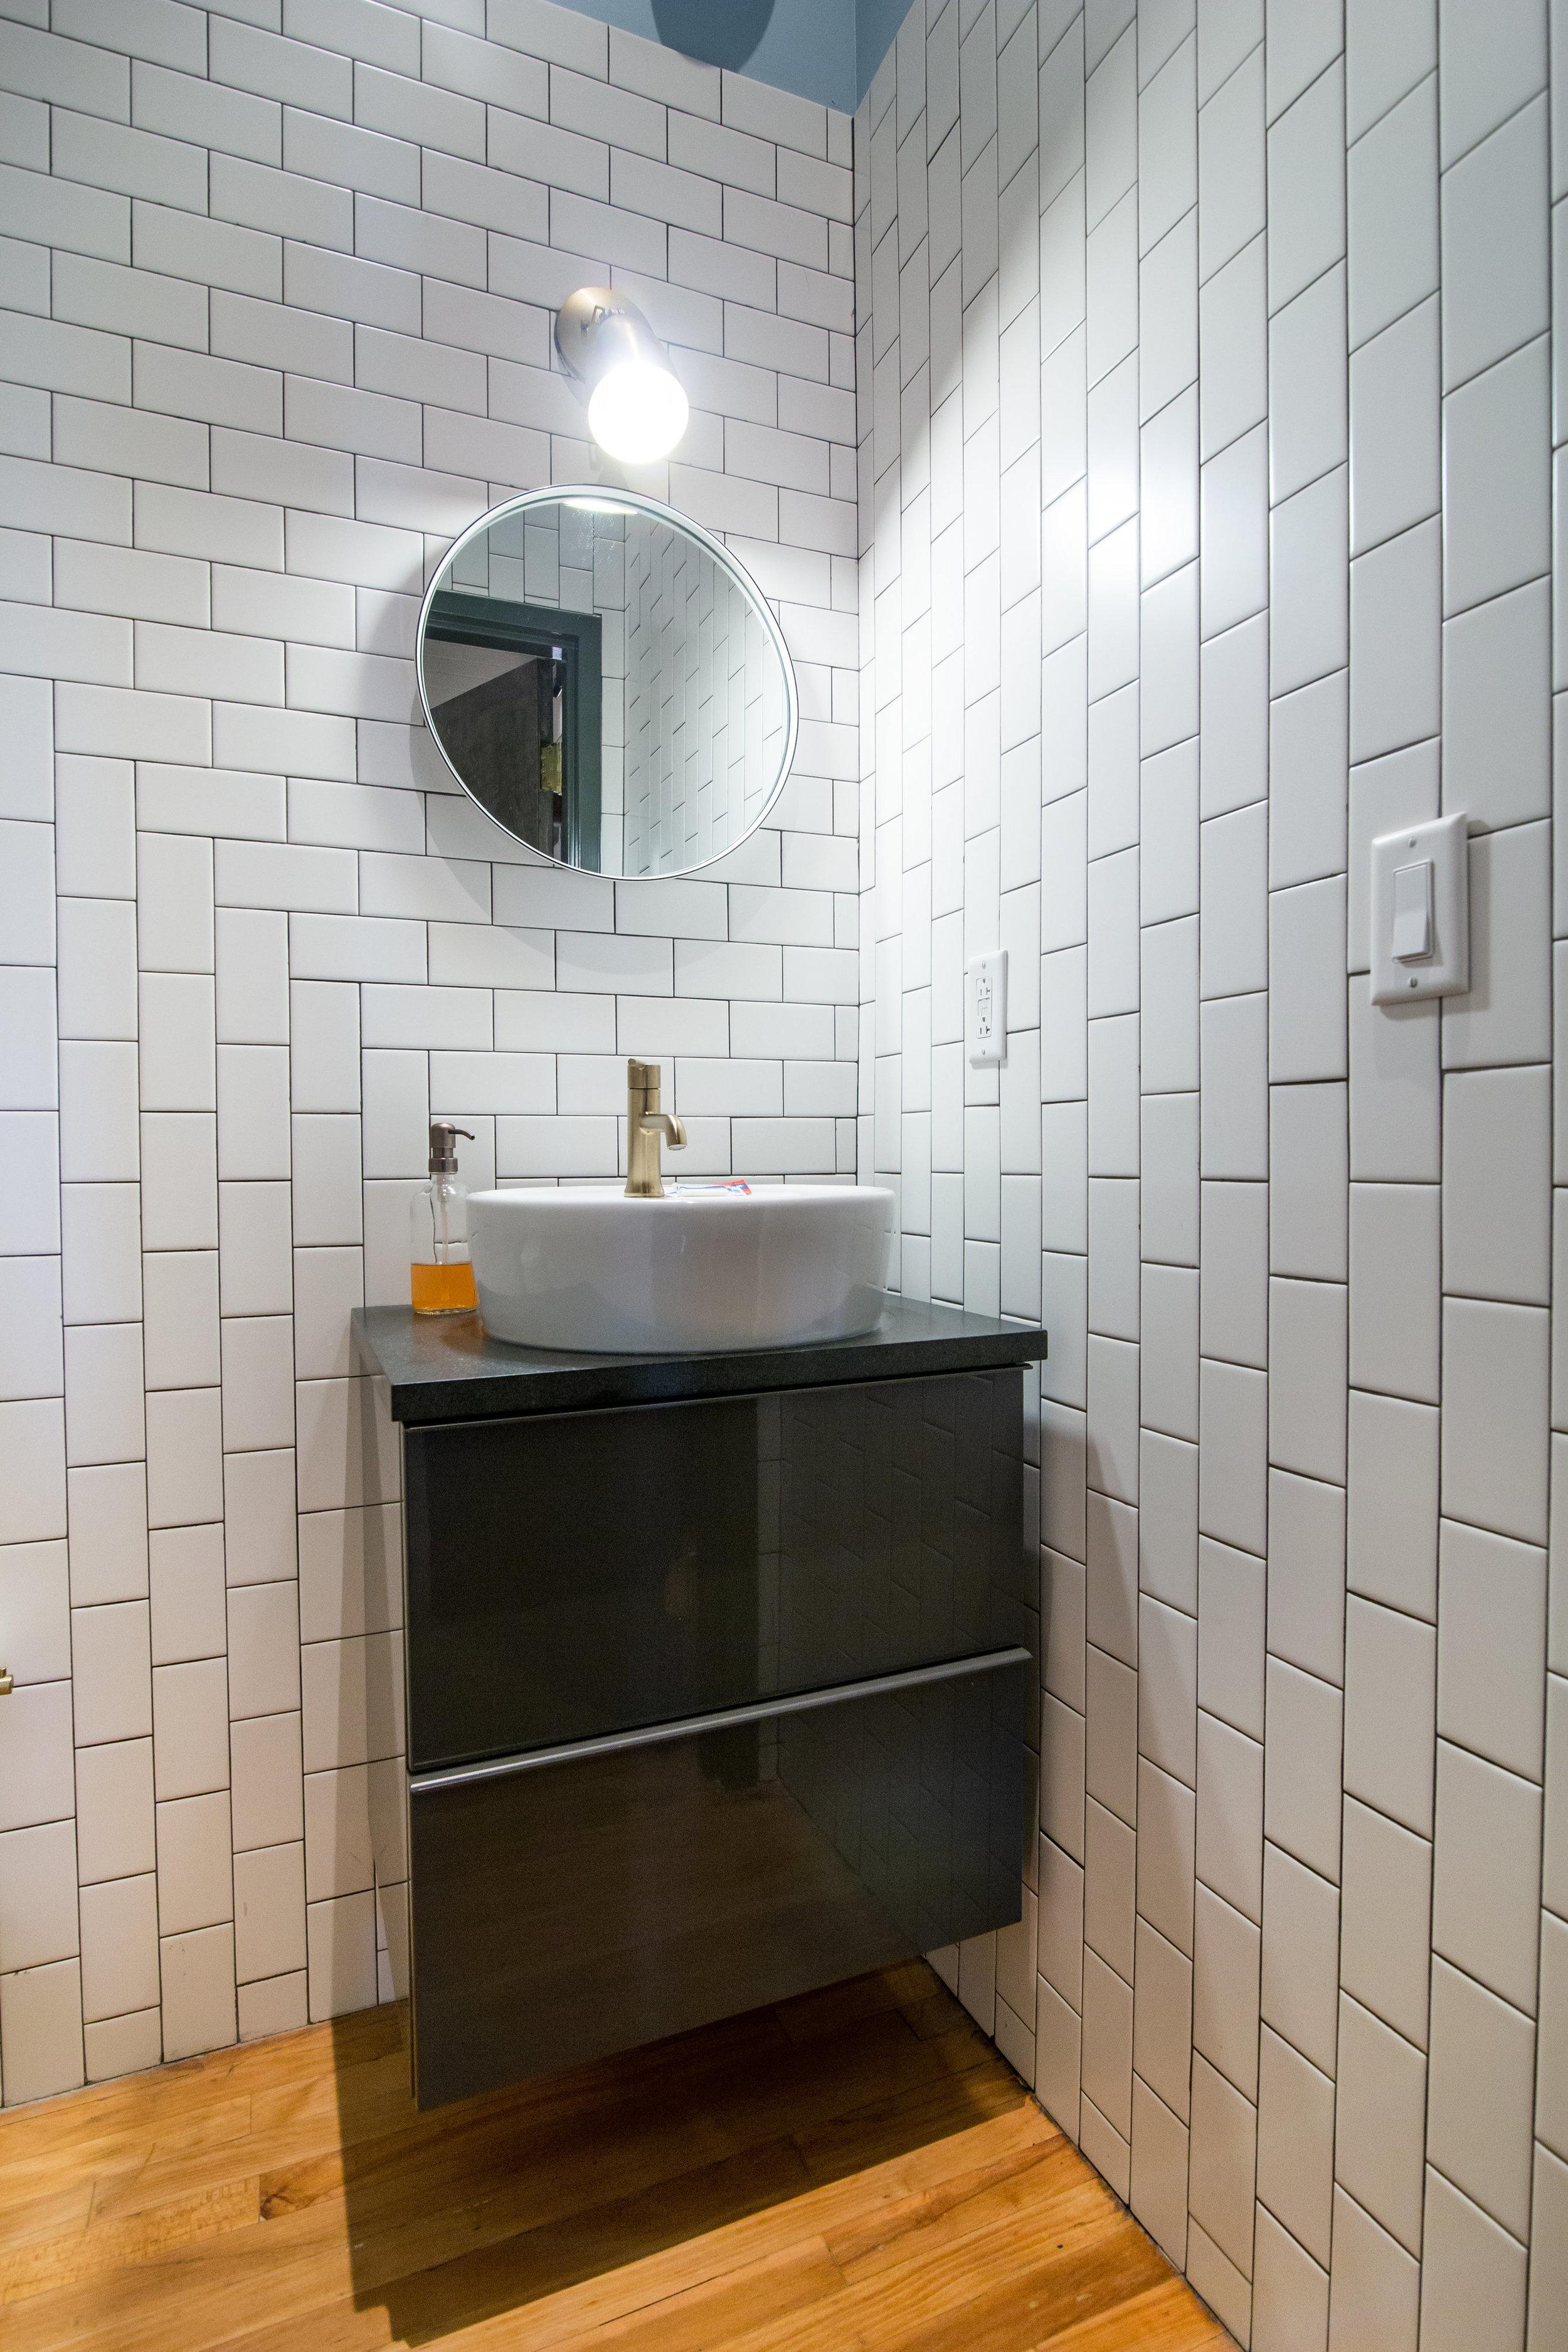 1st floor half bath vanity